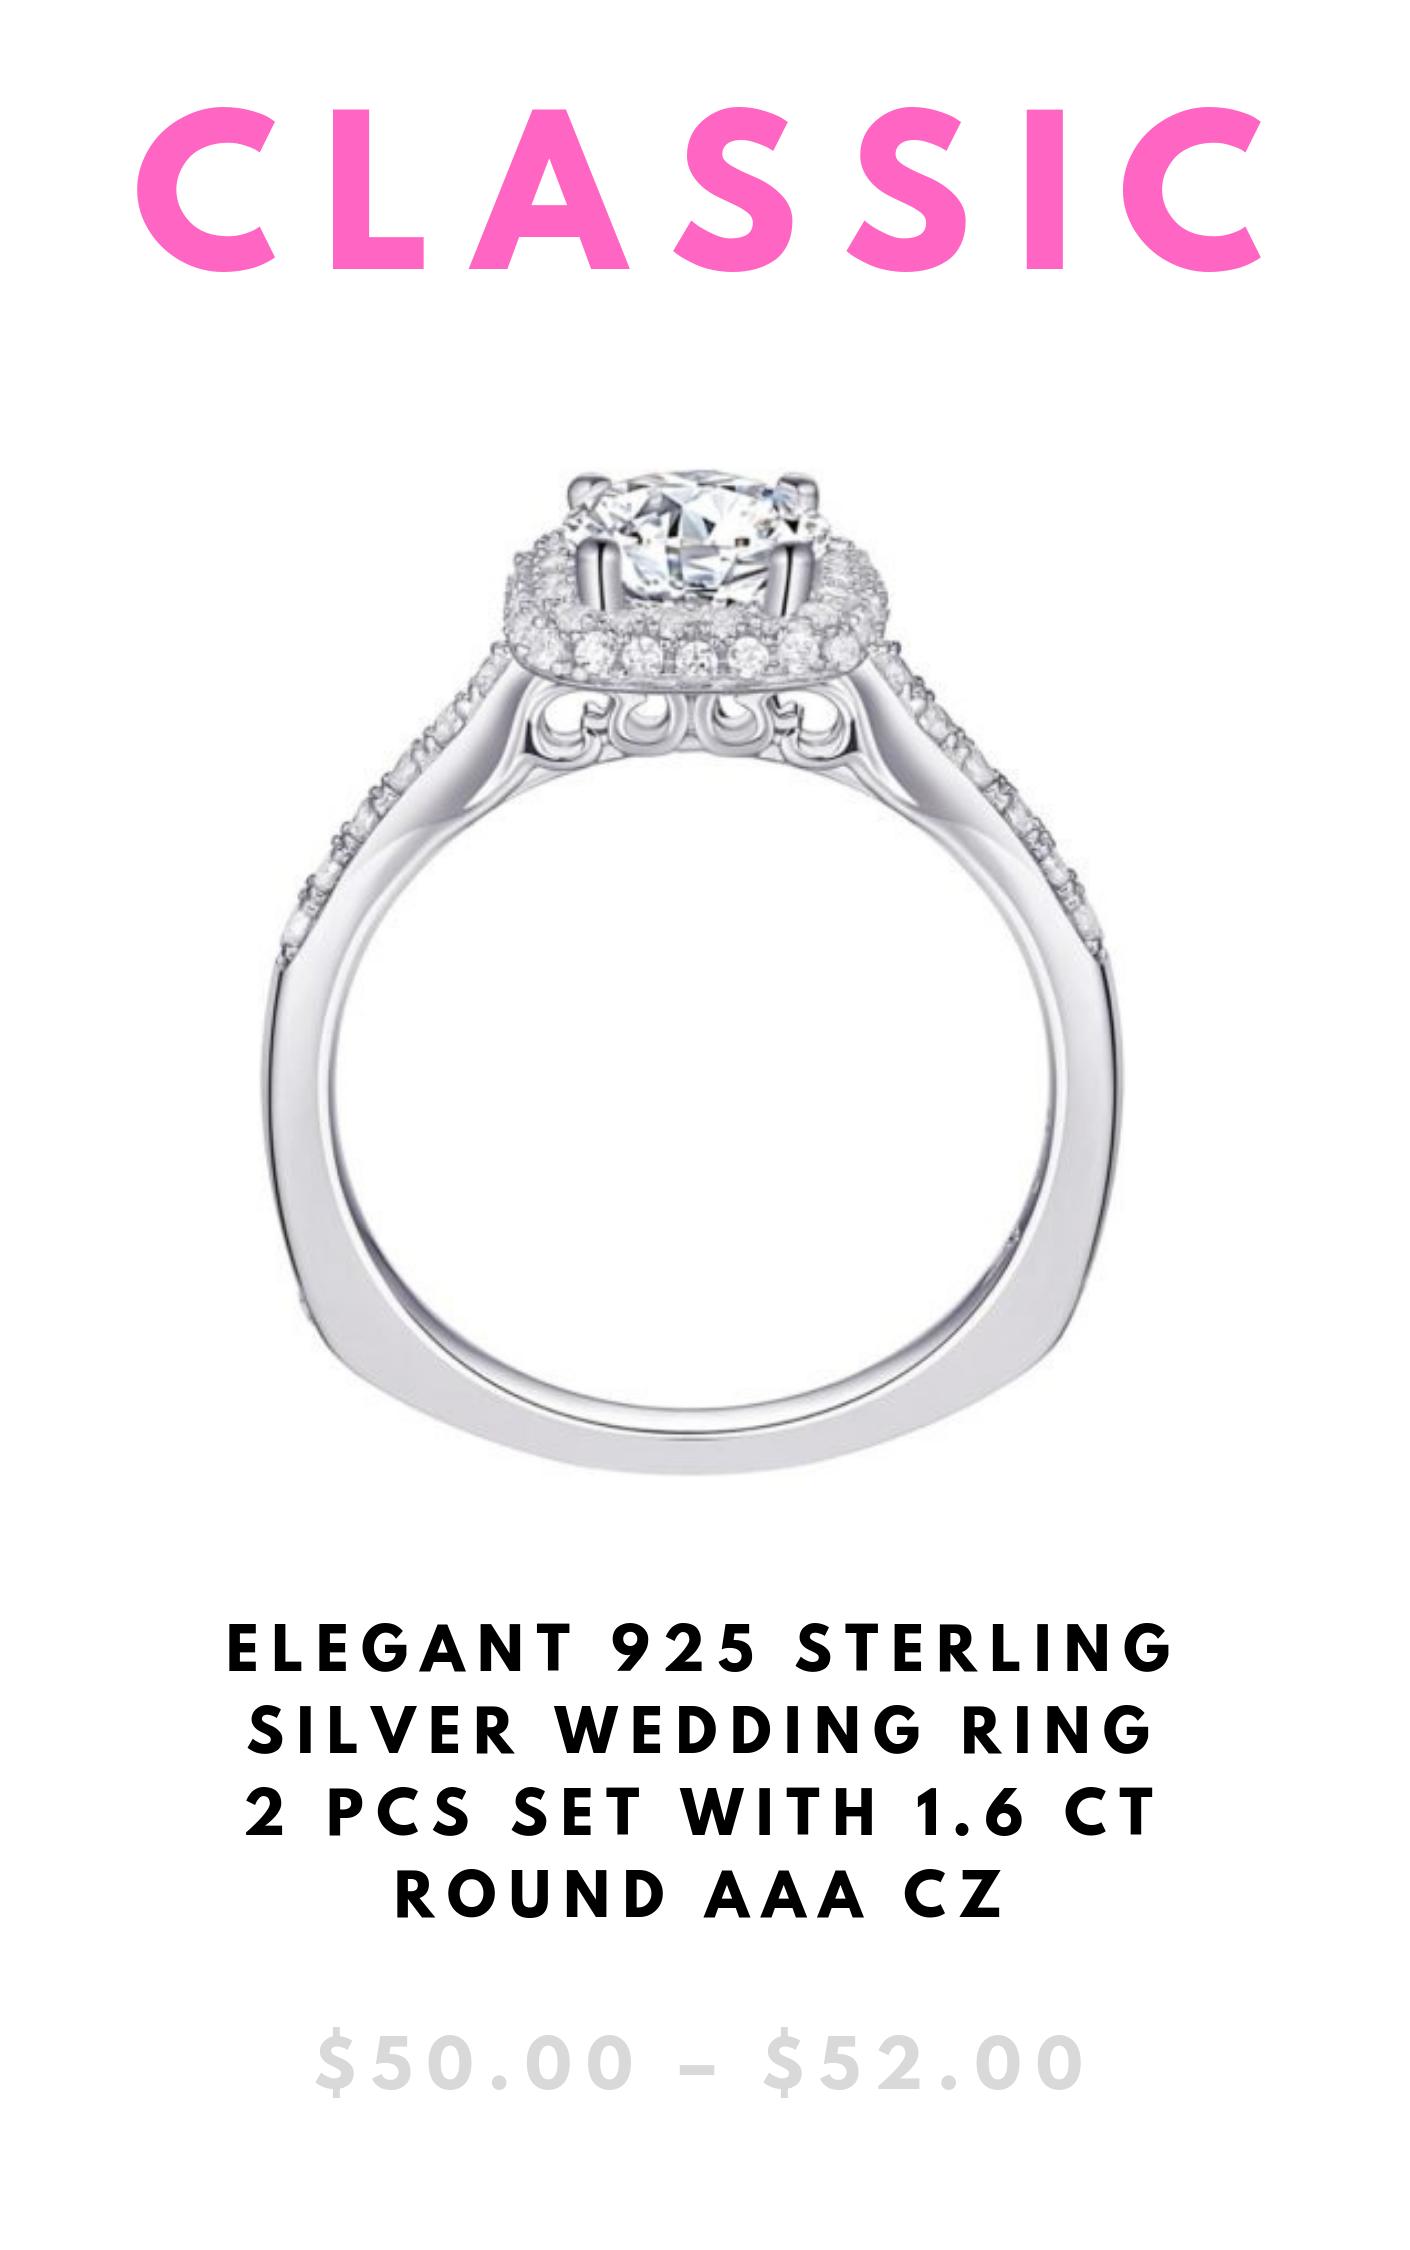 Elegant 925 Sterling Silver Wedding Ring 2 Pcs Set With 1 6 Ct Round Aaa Cz Qooru Sterling Silver Wedding Rings Silver Wedding Rings Wedding Rings